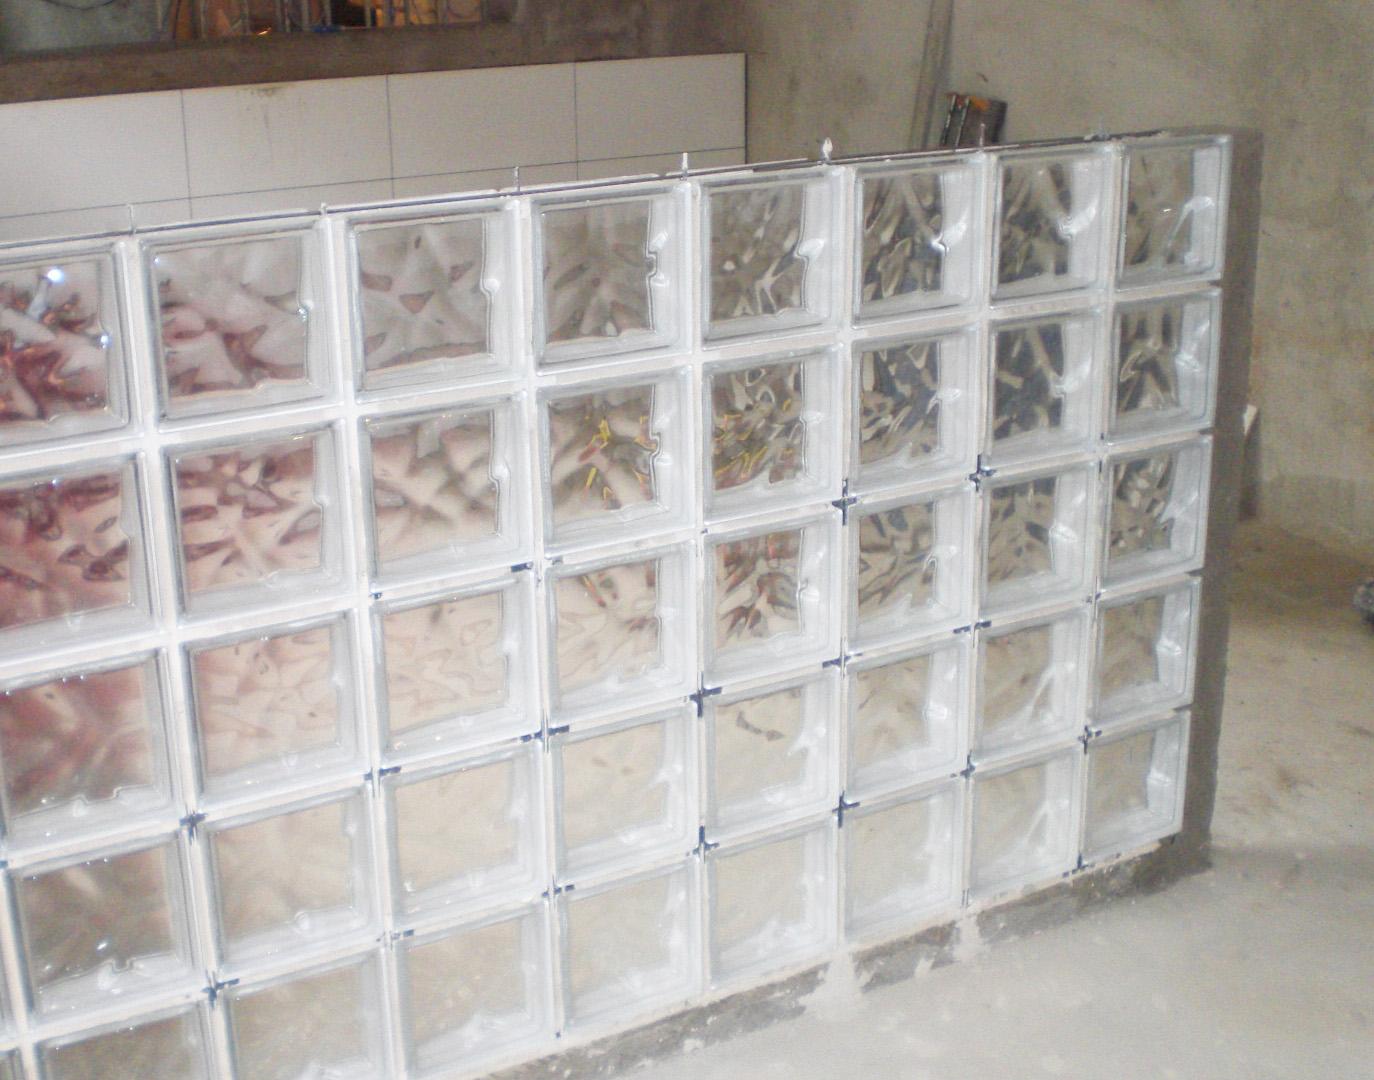 #5D4A40 Blocos De Vidro Ou Box De Tijolo De Vidro Tipos De Box Para Banhei  1374x1080 px Bancada Cozinha Americana Tijolo Vidro #1307 imagens